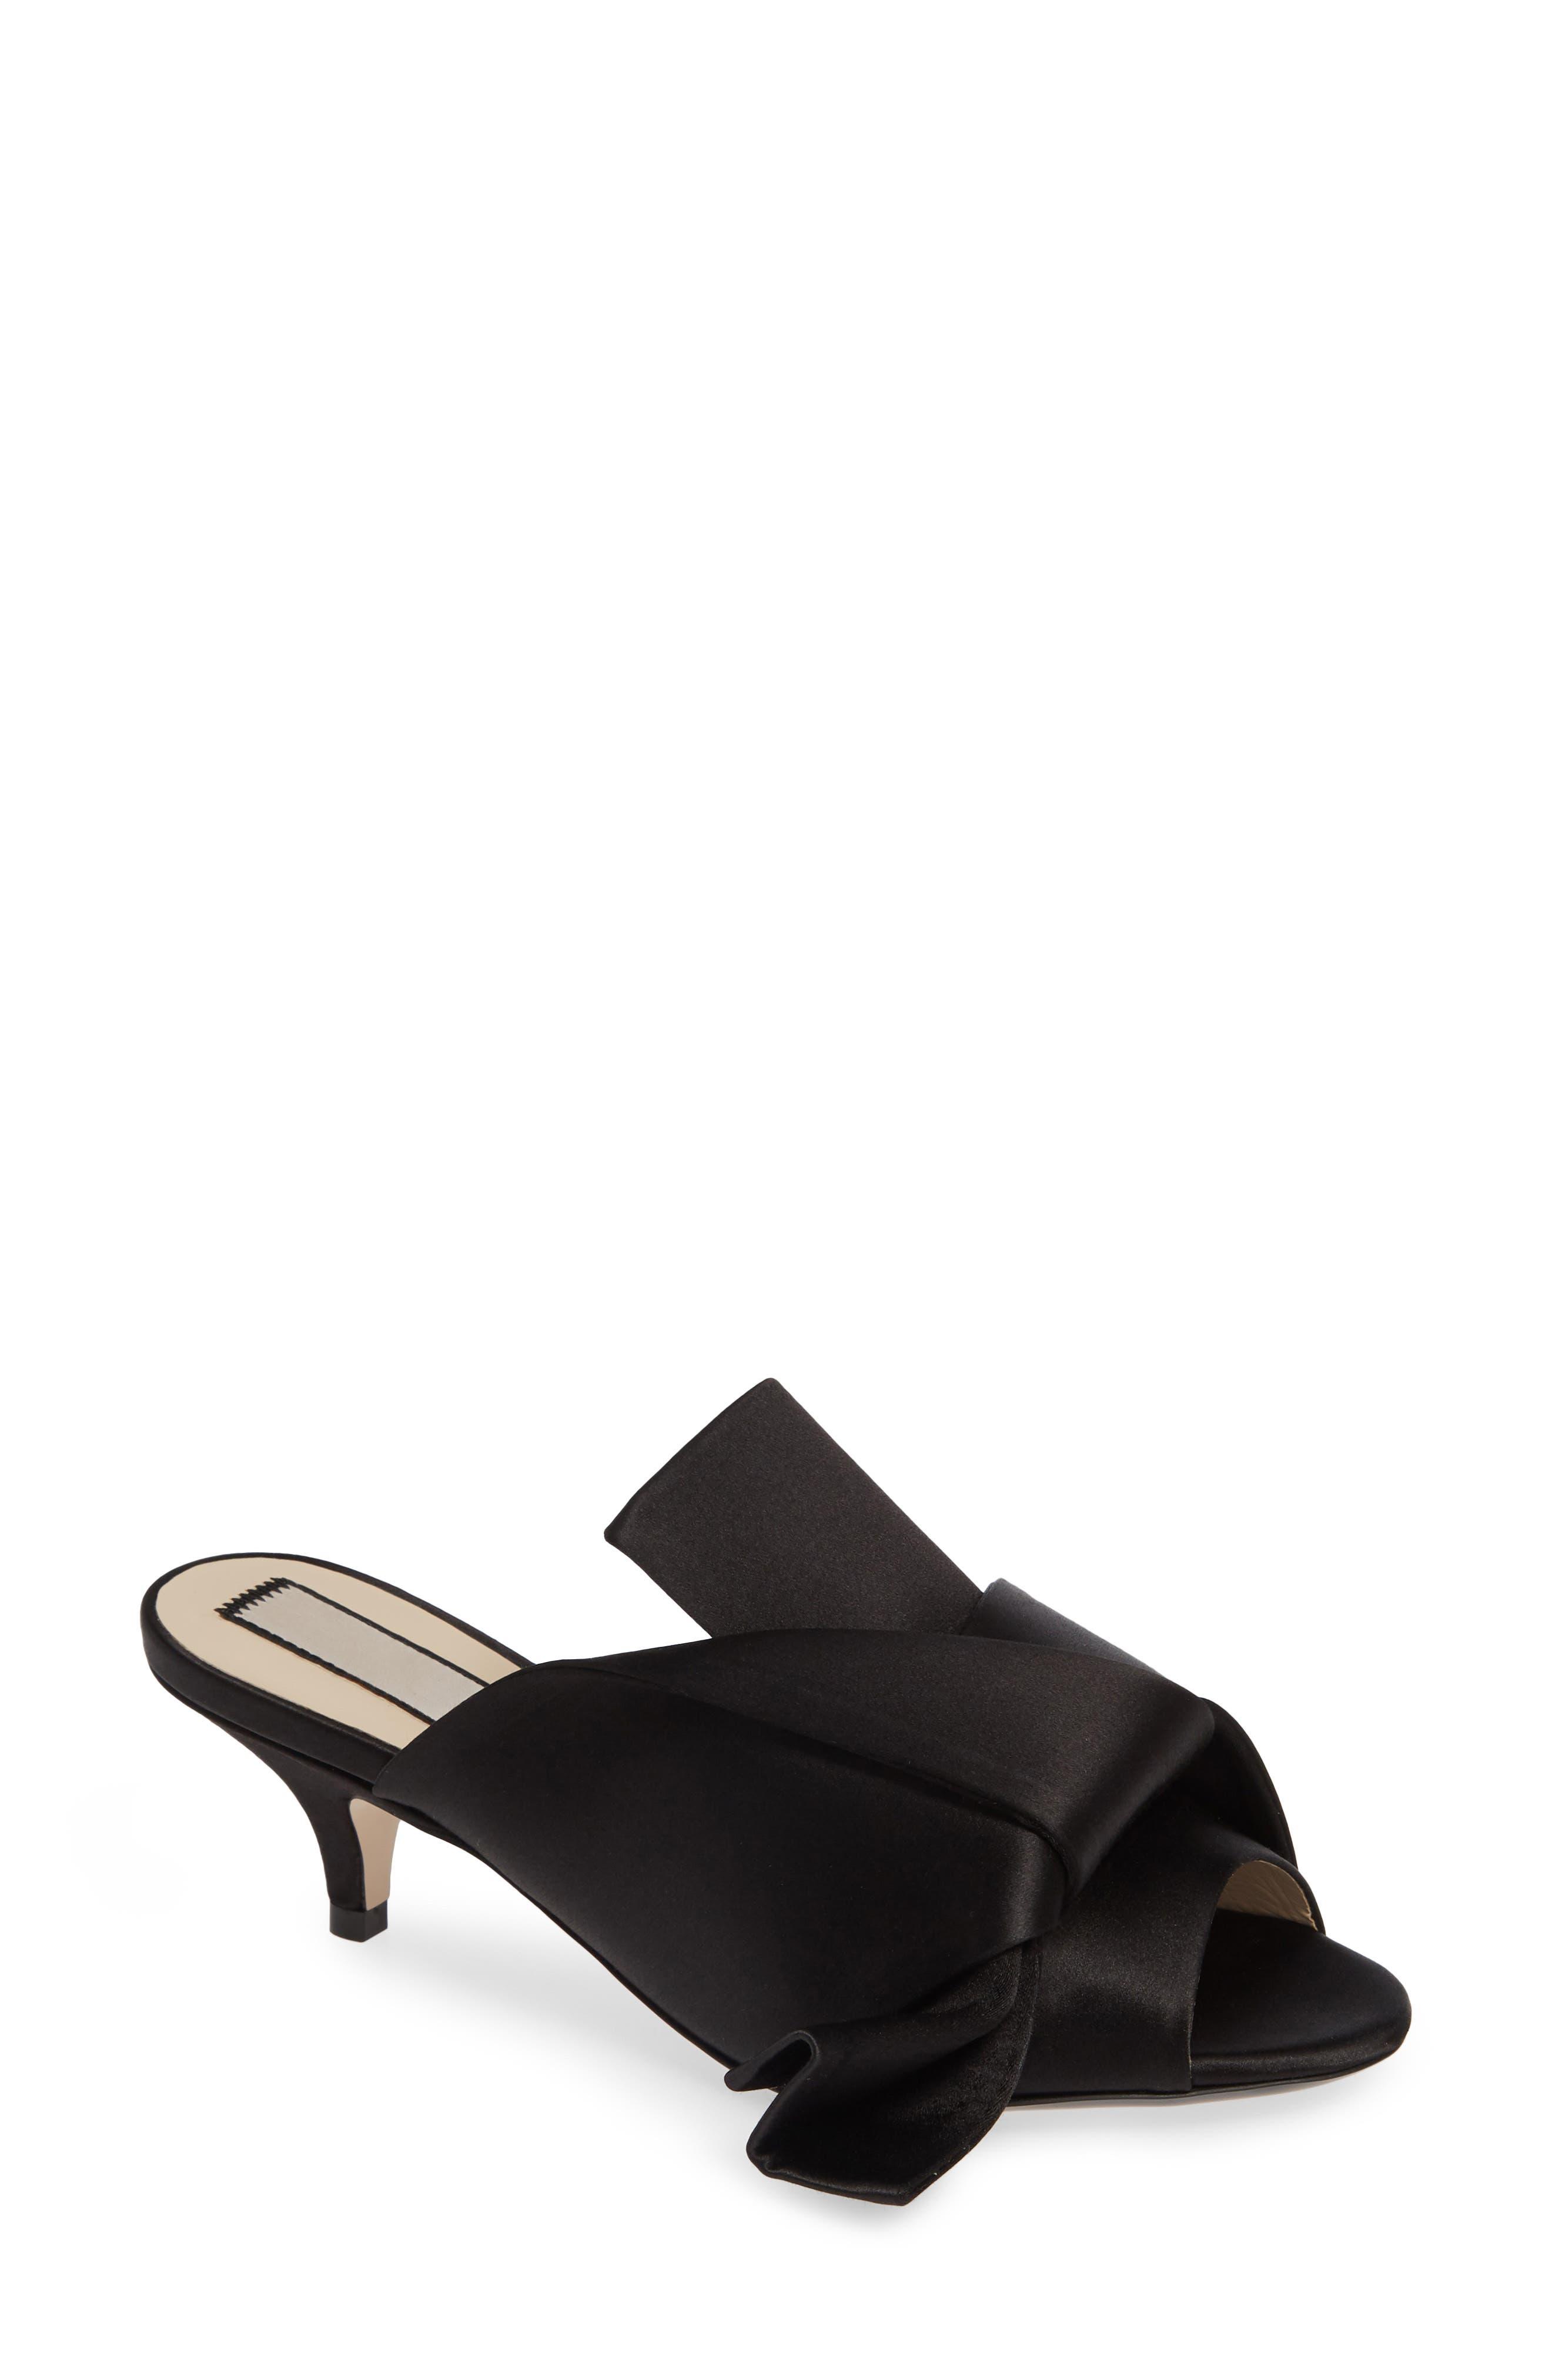 Bow Slide Sandal,                             Main thumbnail 1, color,                             BLACK